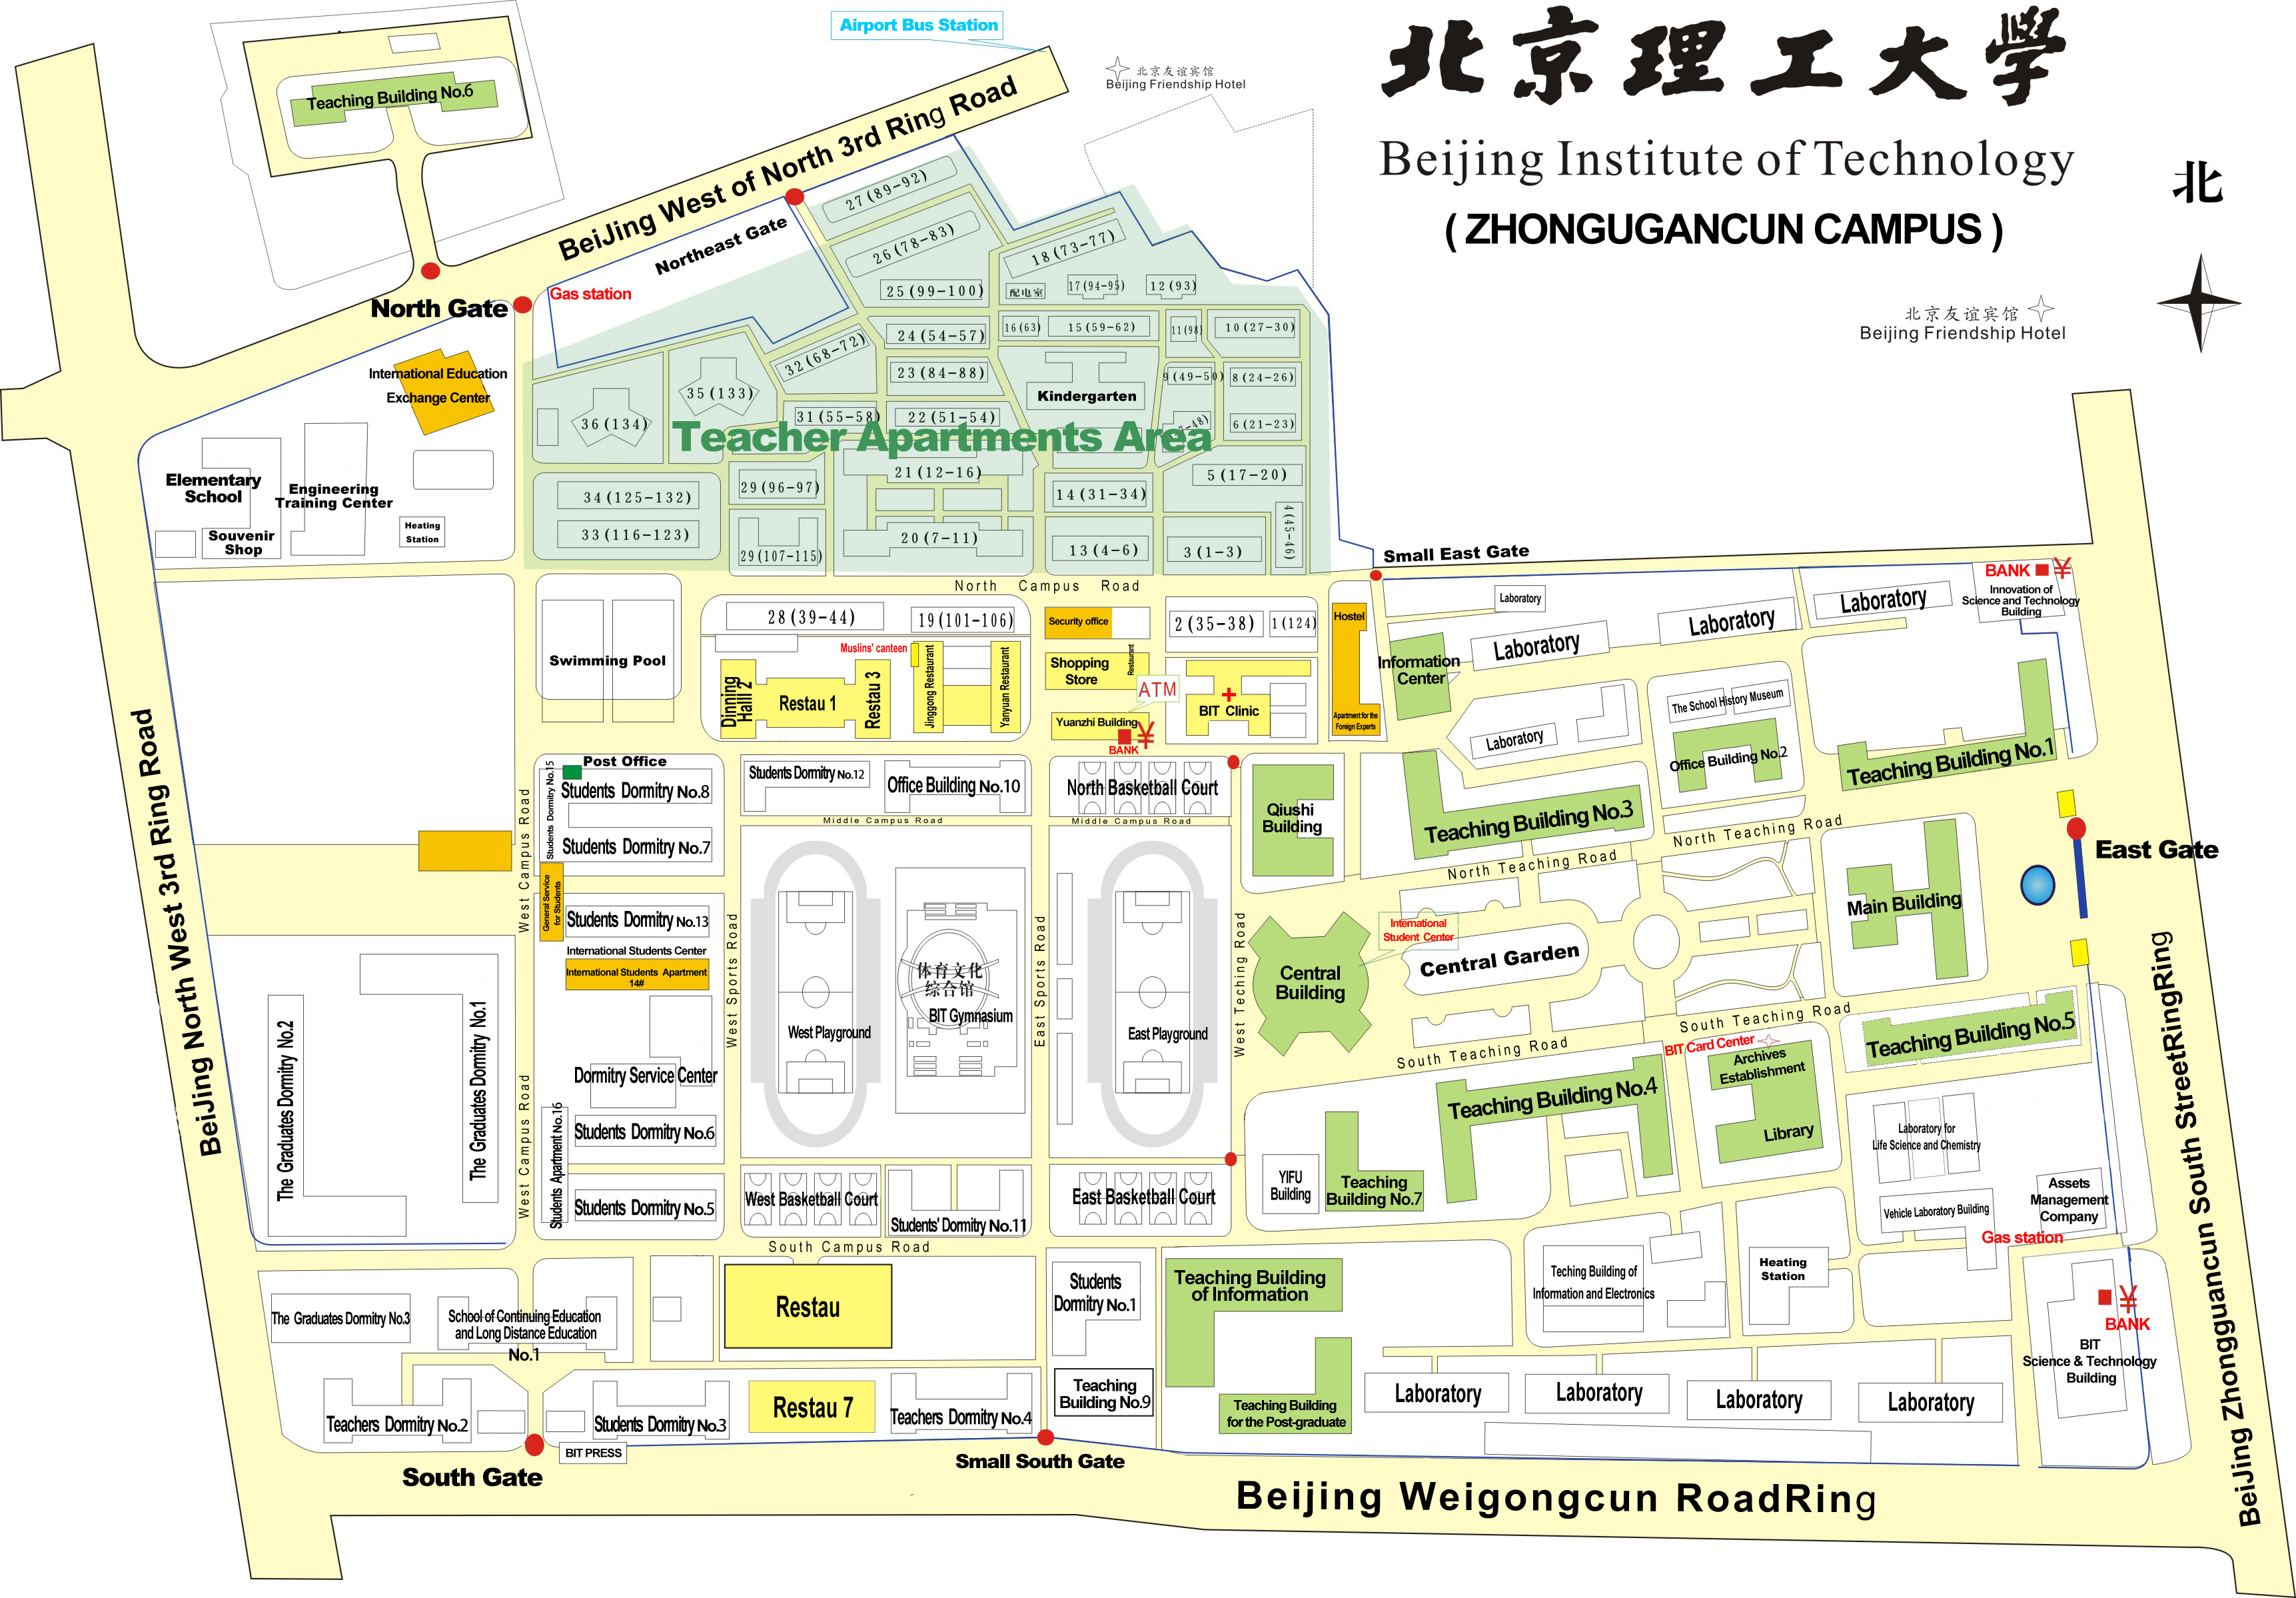 Beijing Institute of Technology Campus Ichnography 1